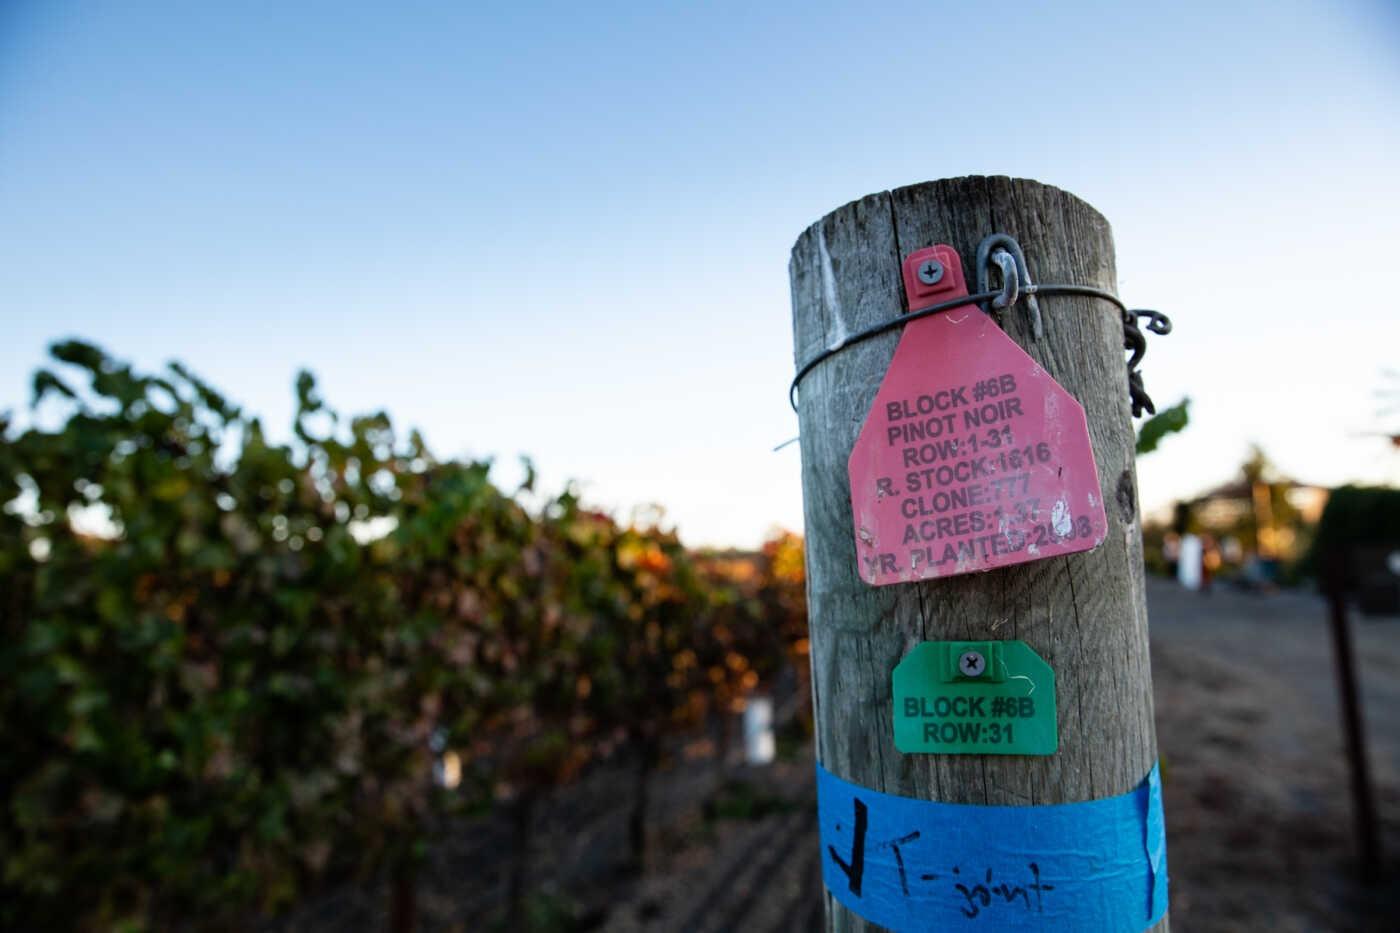 vineyard endpost with Pinot Noir